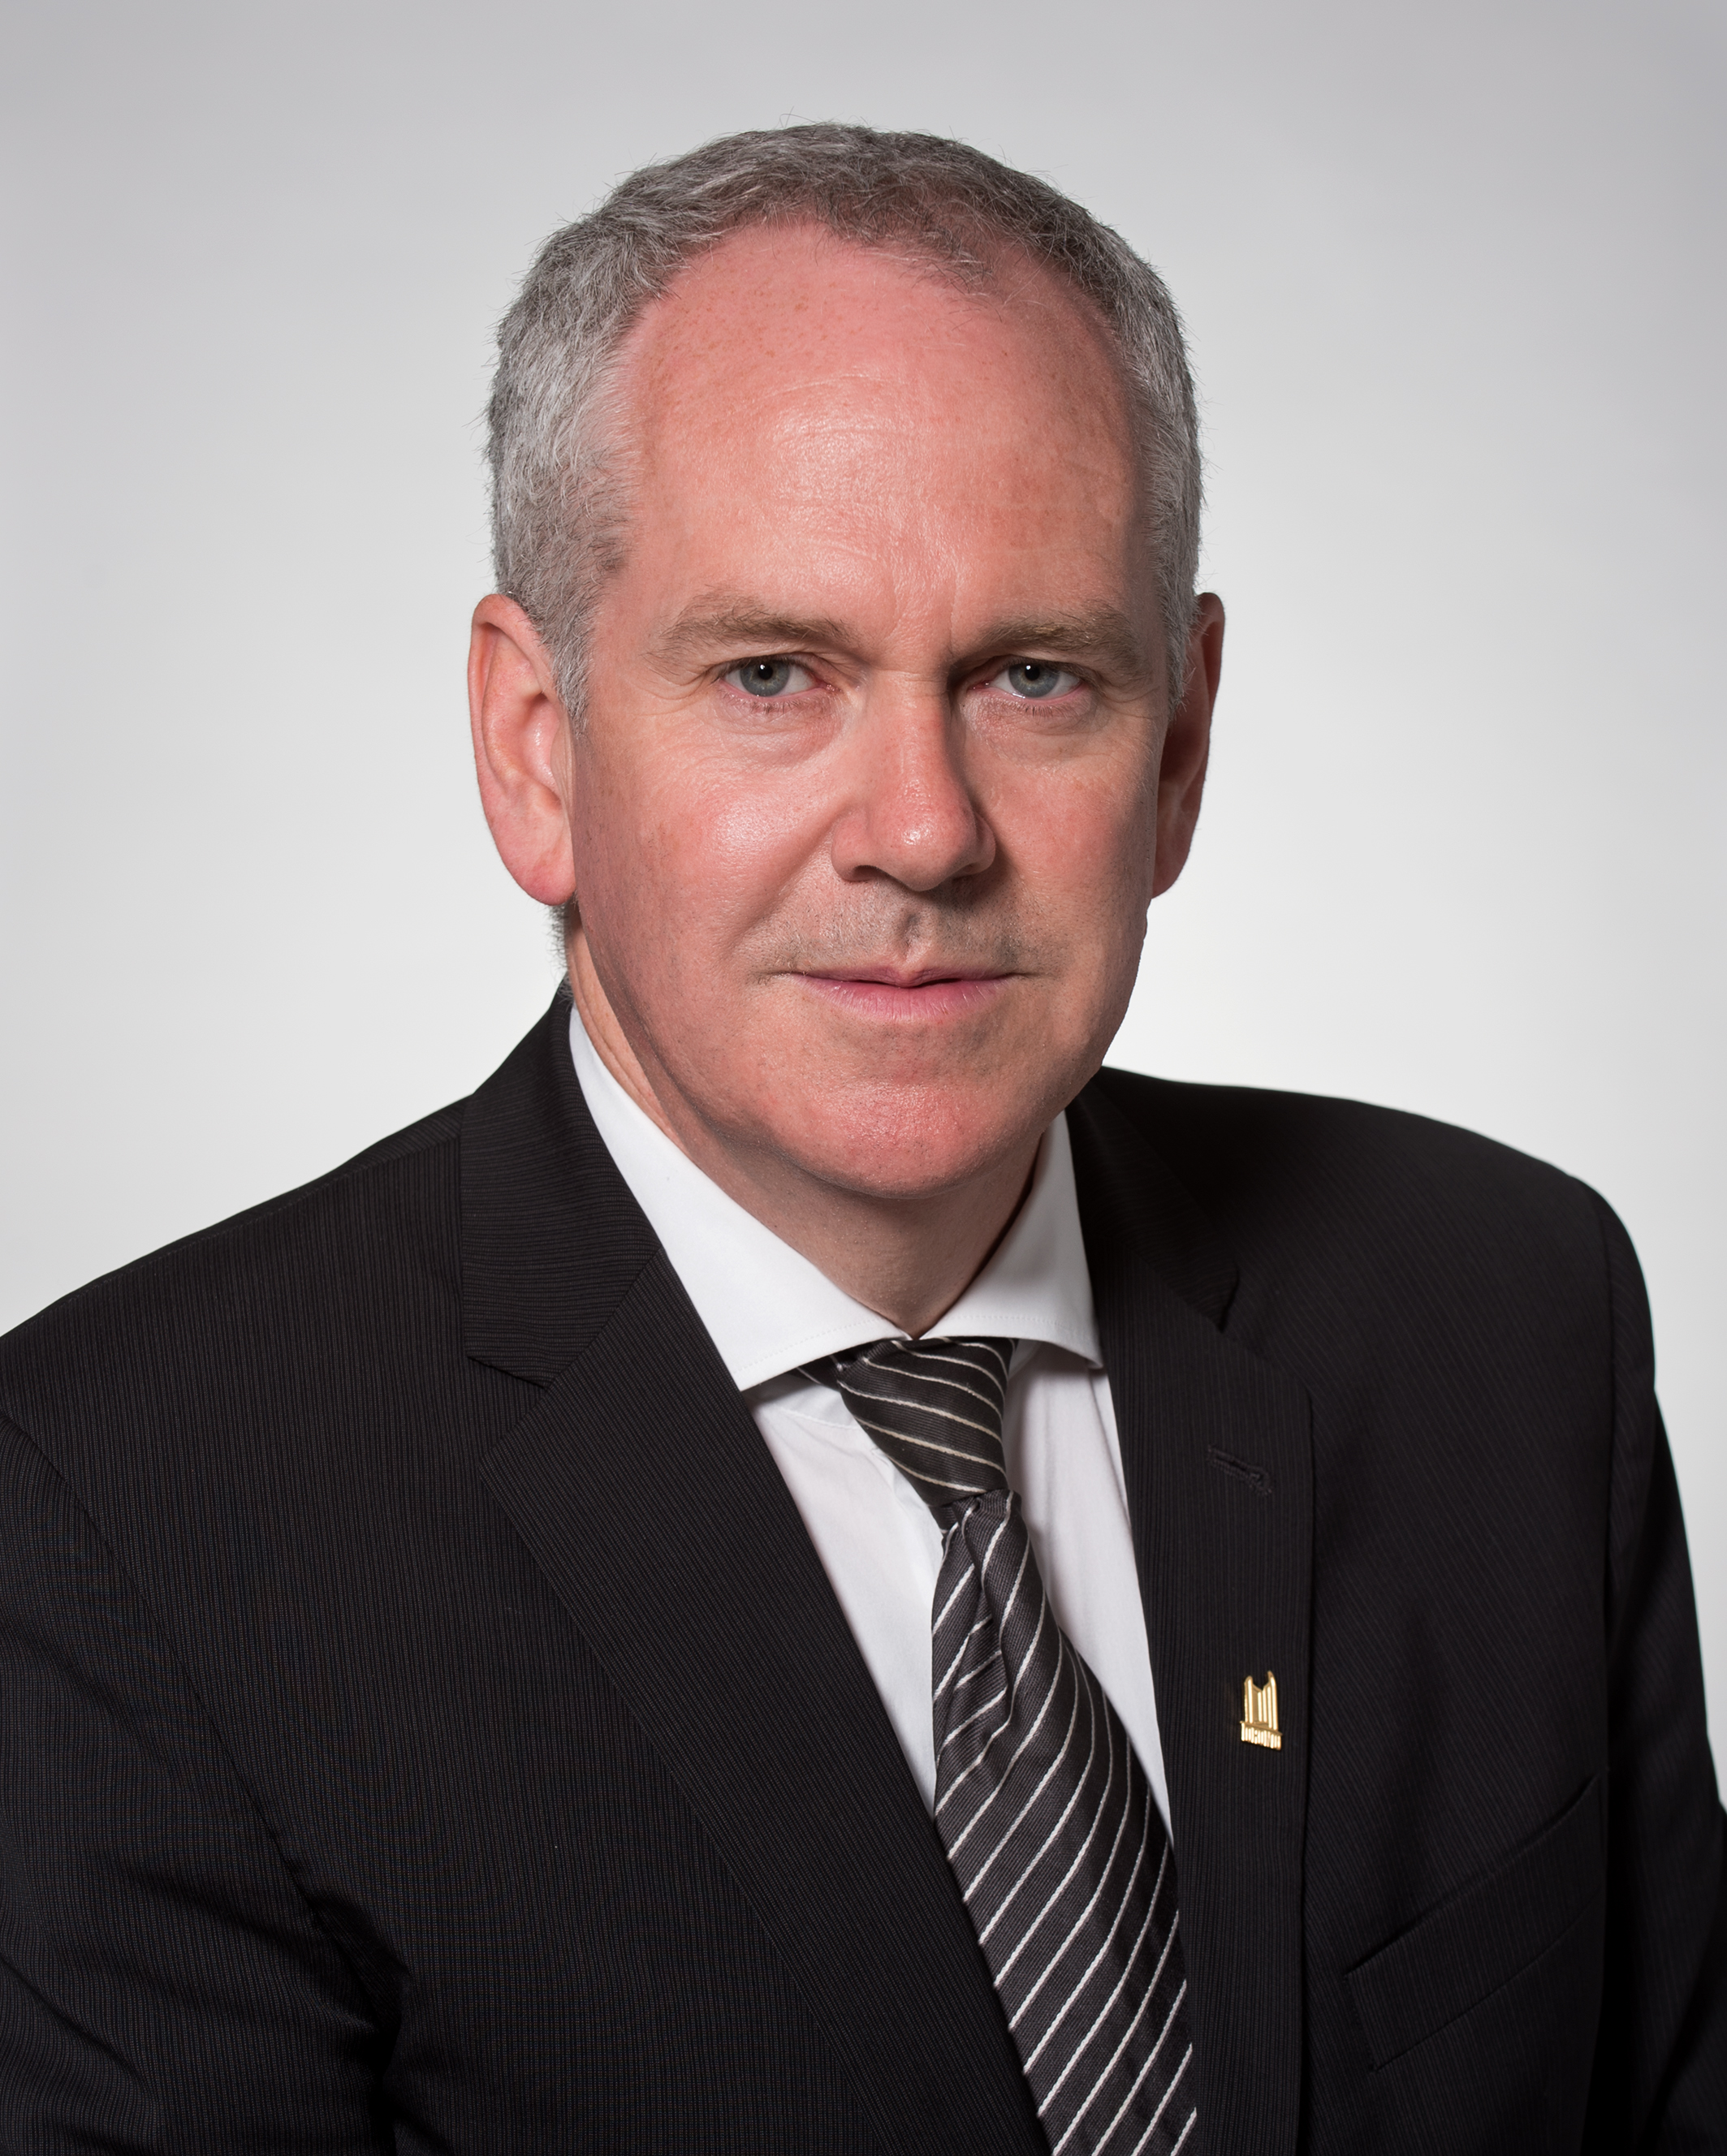 Photo of Chris Murray, City of Toronto City Manager